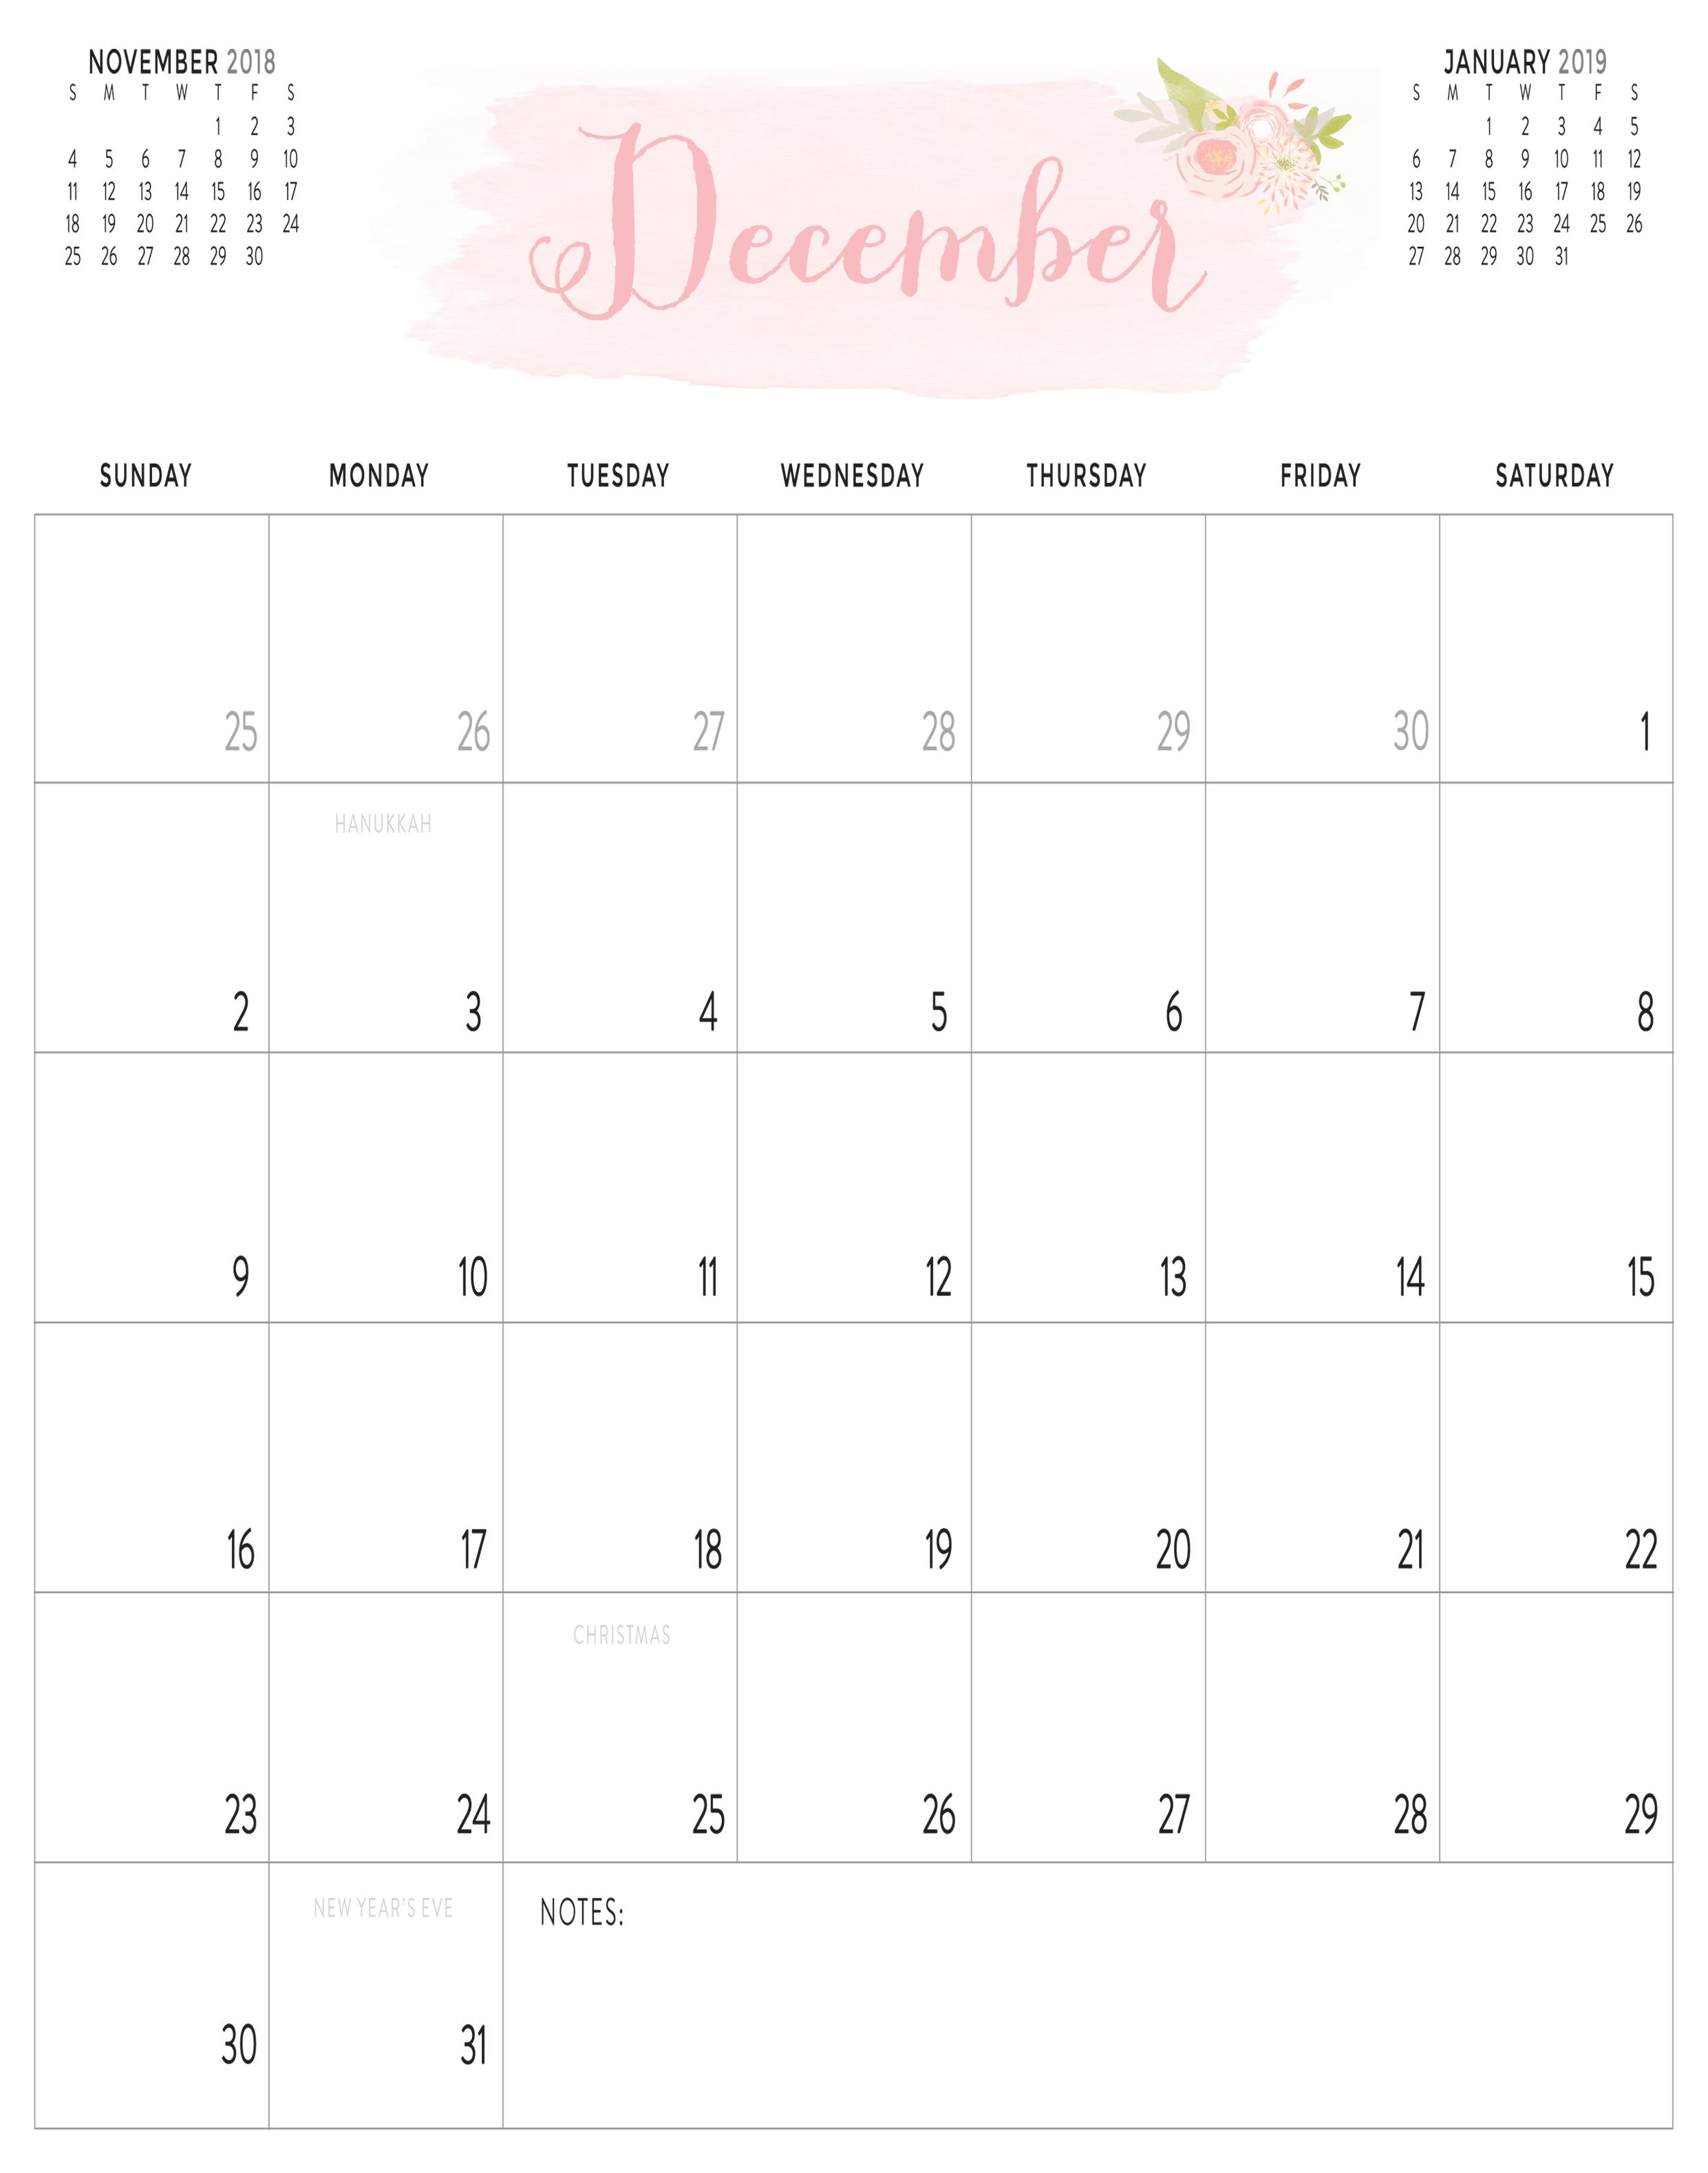 December 2018 Calendar Printable PDF